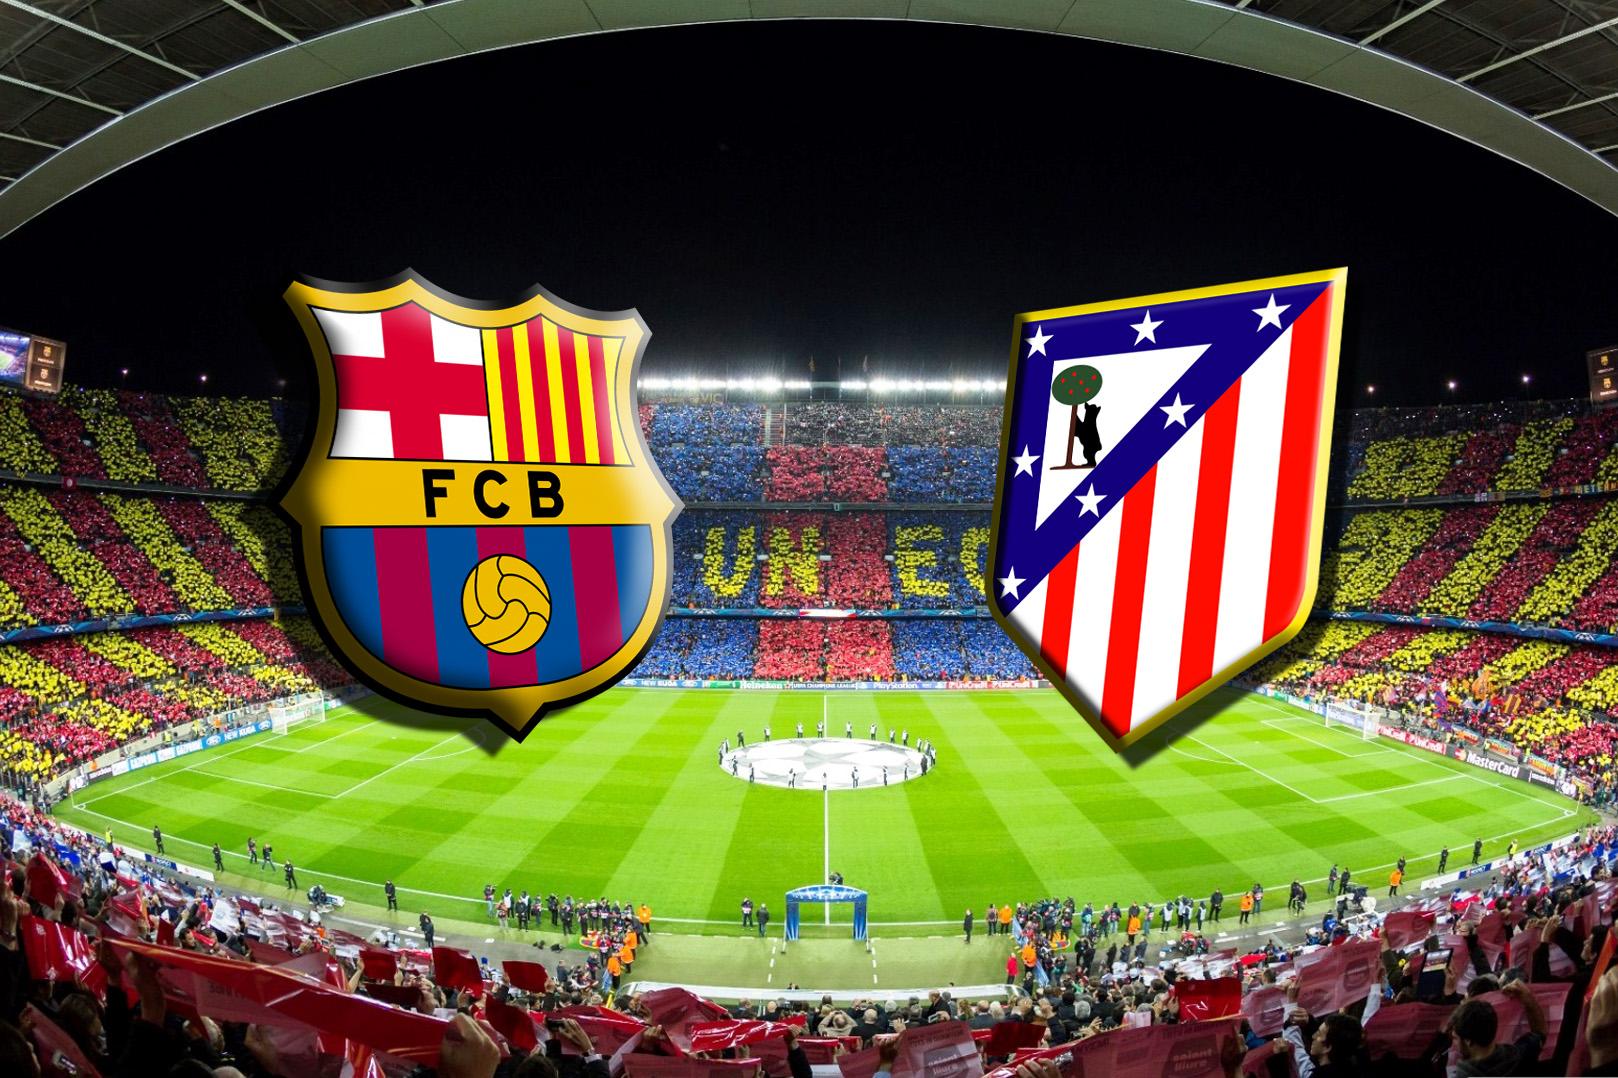 Прогноз на матч Барселона - Атлетико Мадрид 7 февраля 2017